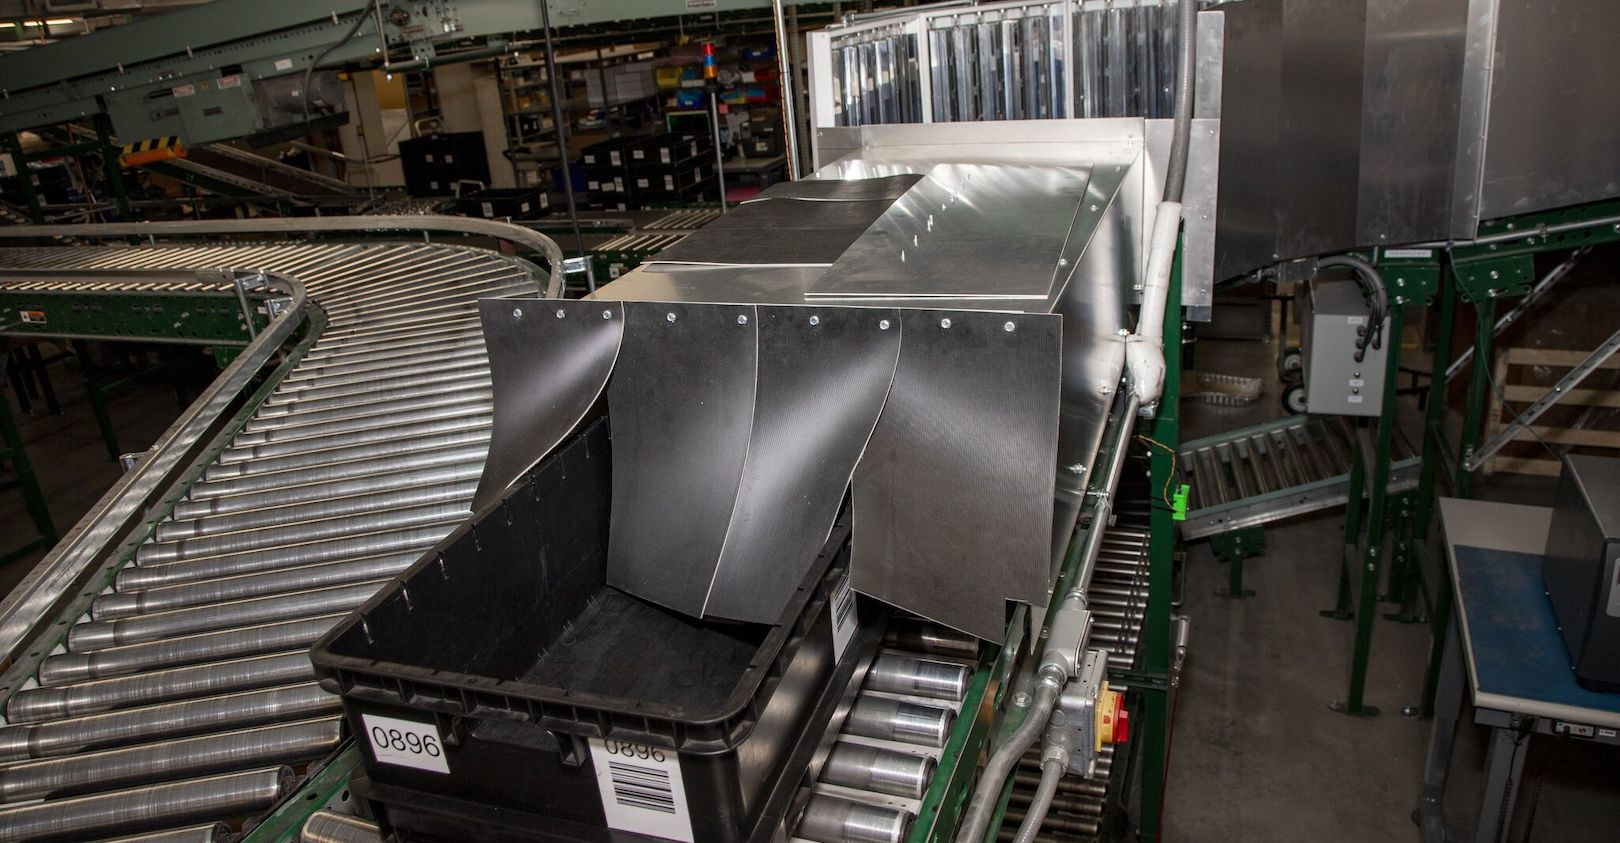 Digi-Key Hacks UV Into Conveyor Line to Protect Warehouse Staff